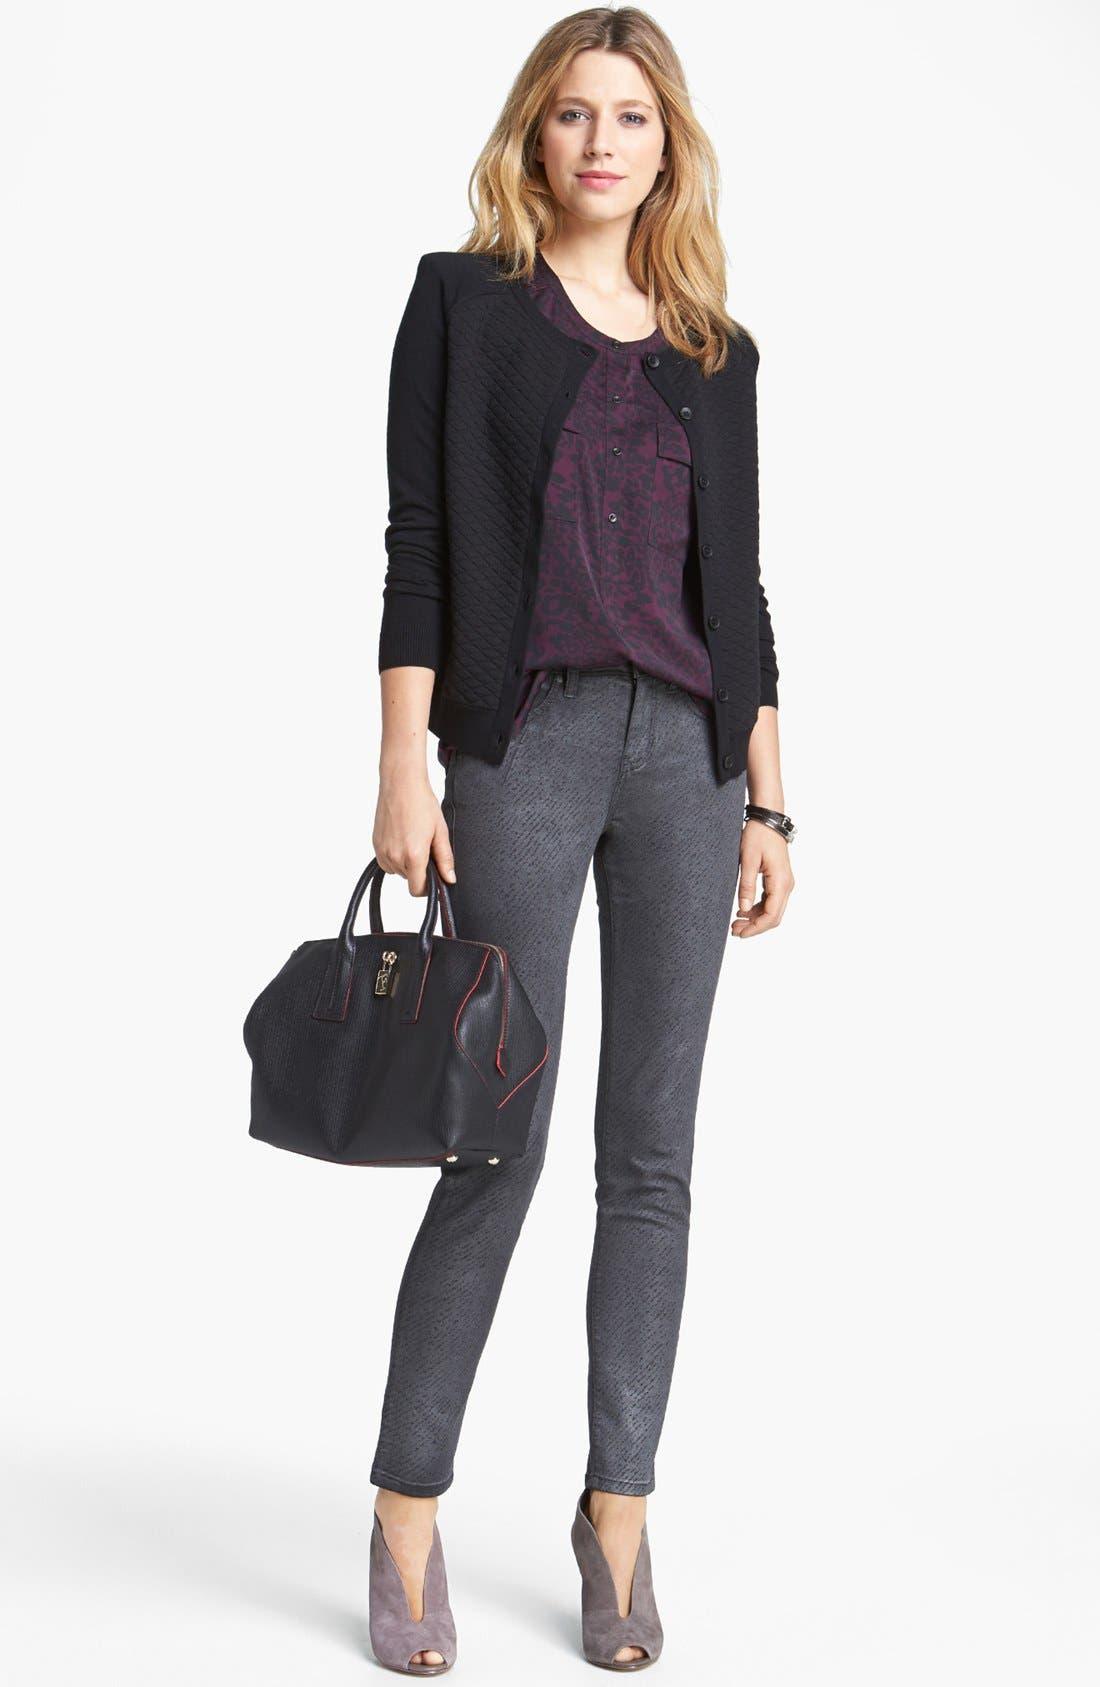 Alternate Image 1 Selected - Halogen® Cardigan, Trouvé Blouse & Jag Jeans Skinny Jeans